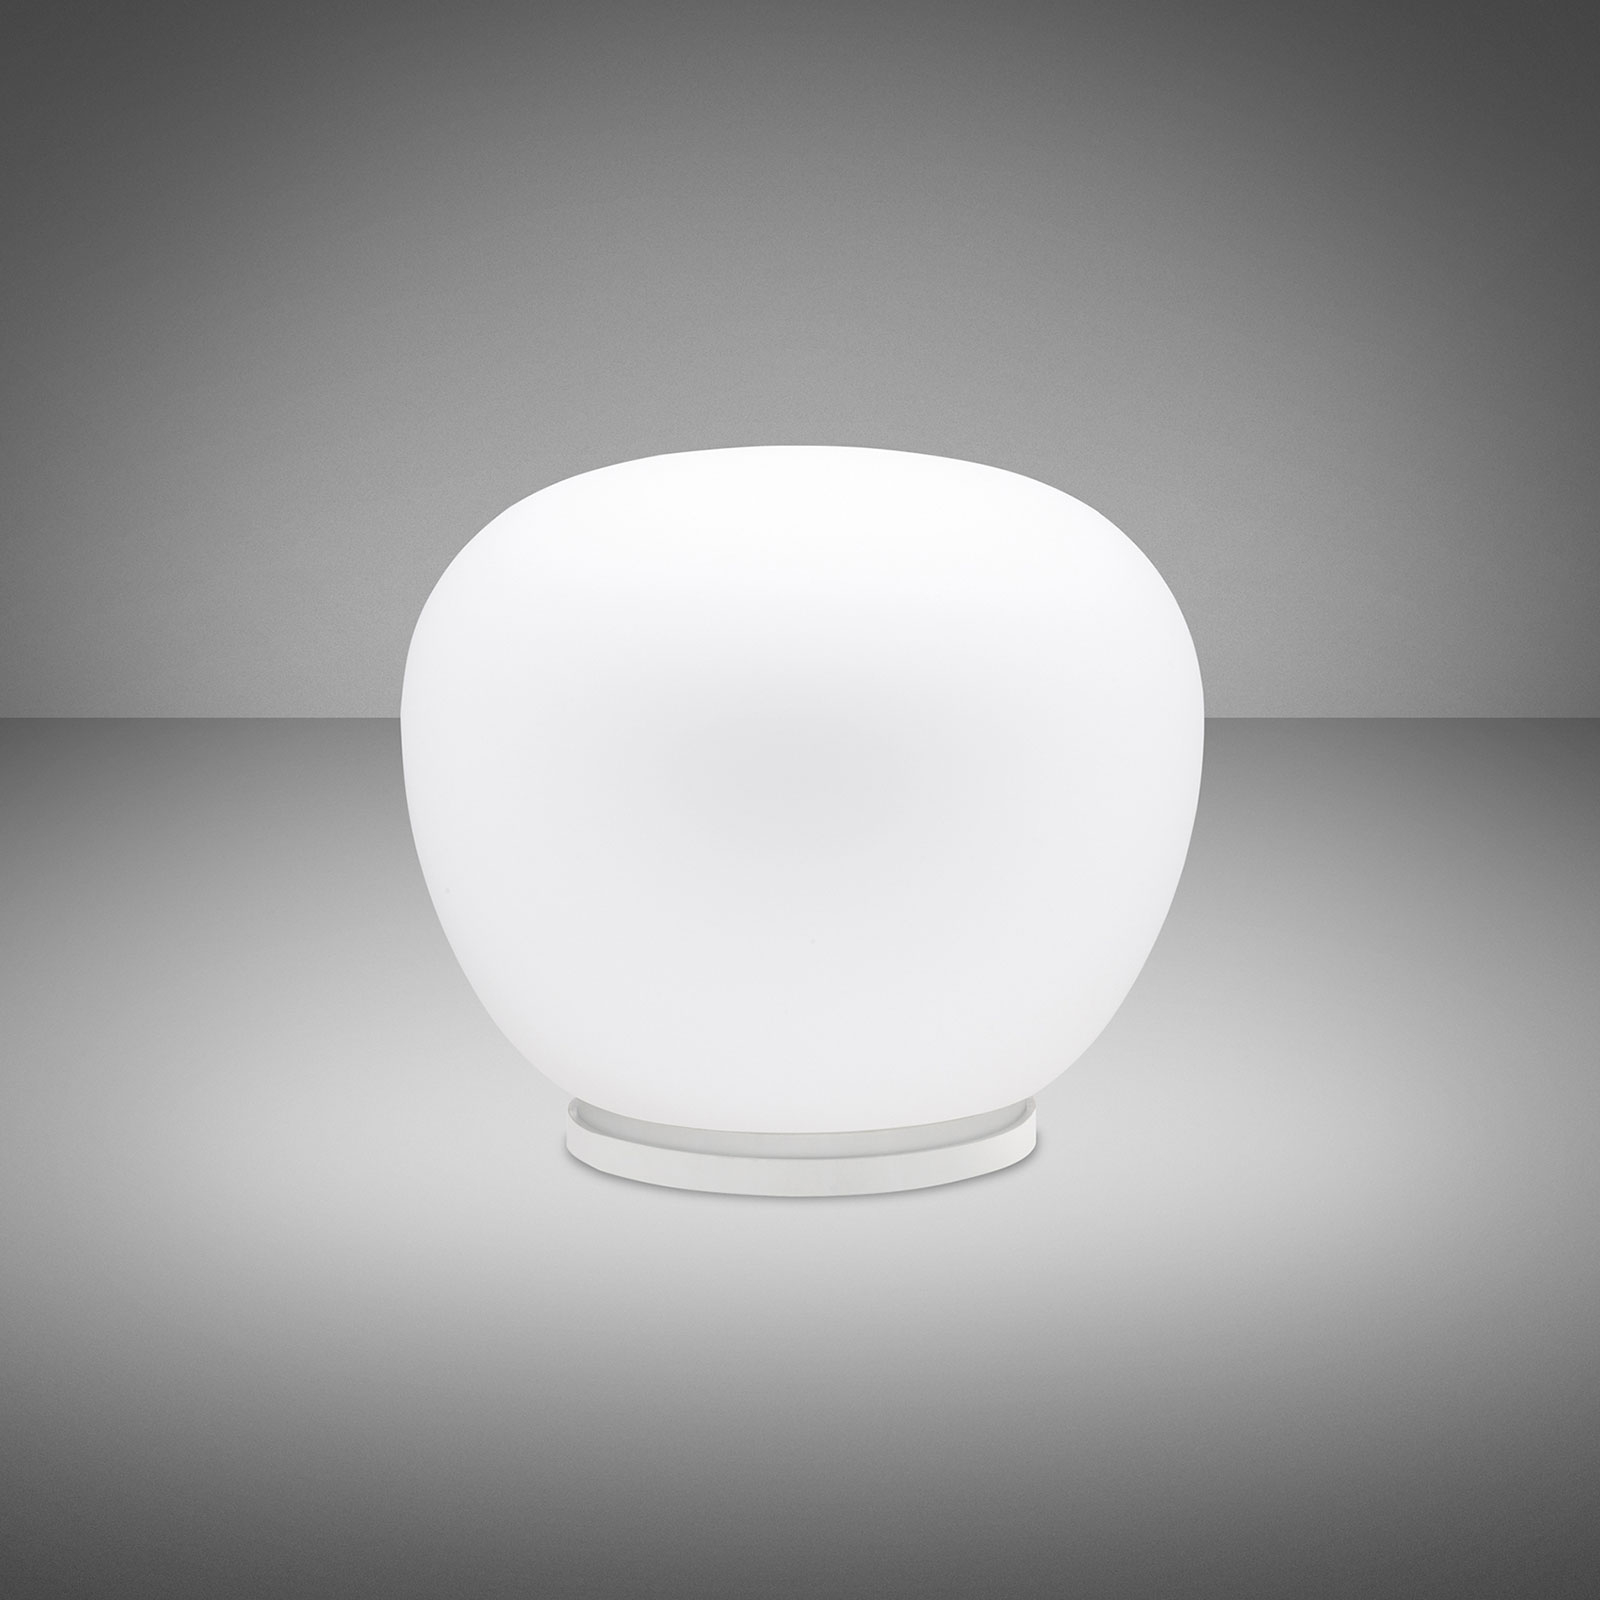 Fabbian Lumi Mochi lámpara de mesa, tumbada Ø 30cm